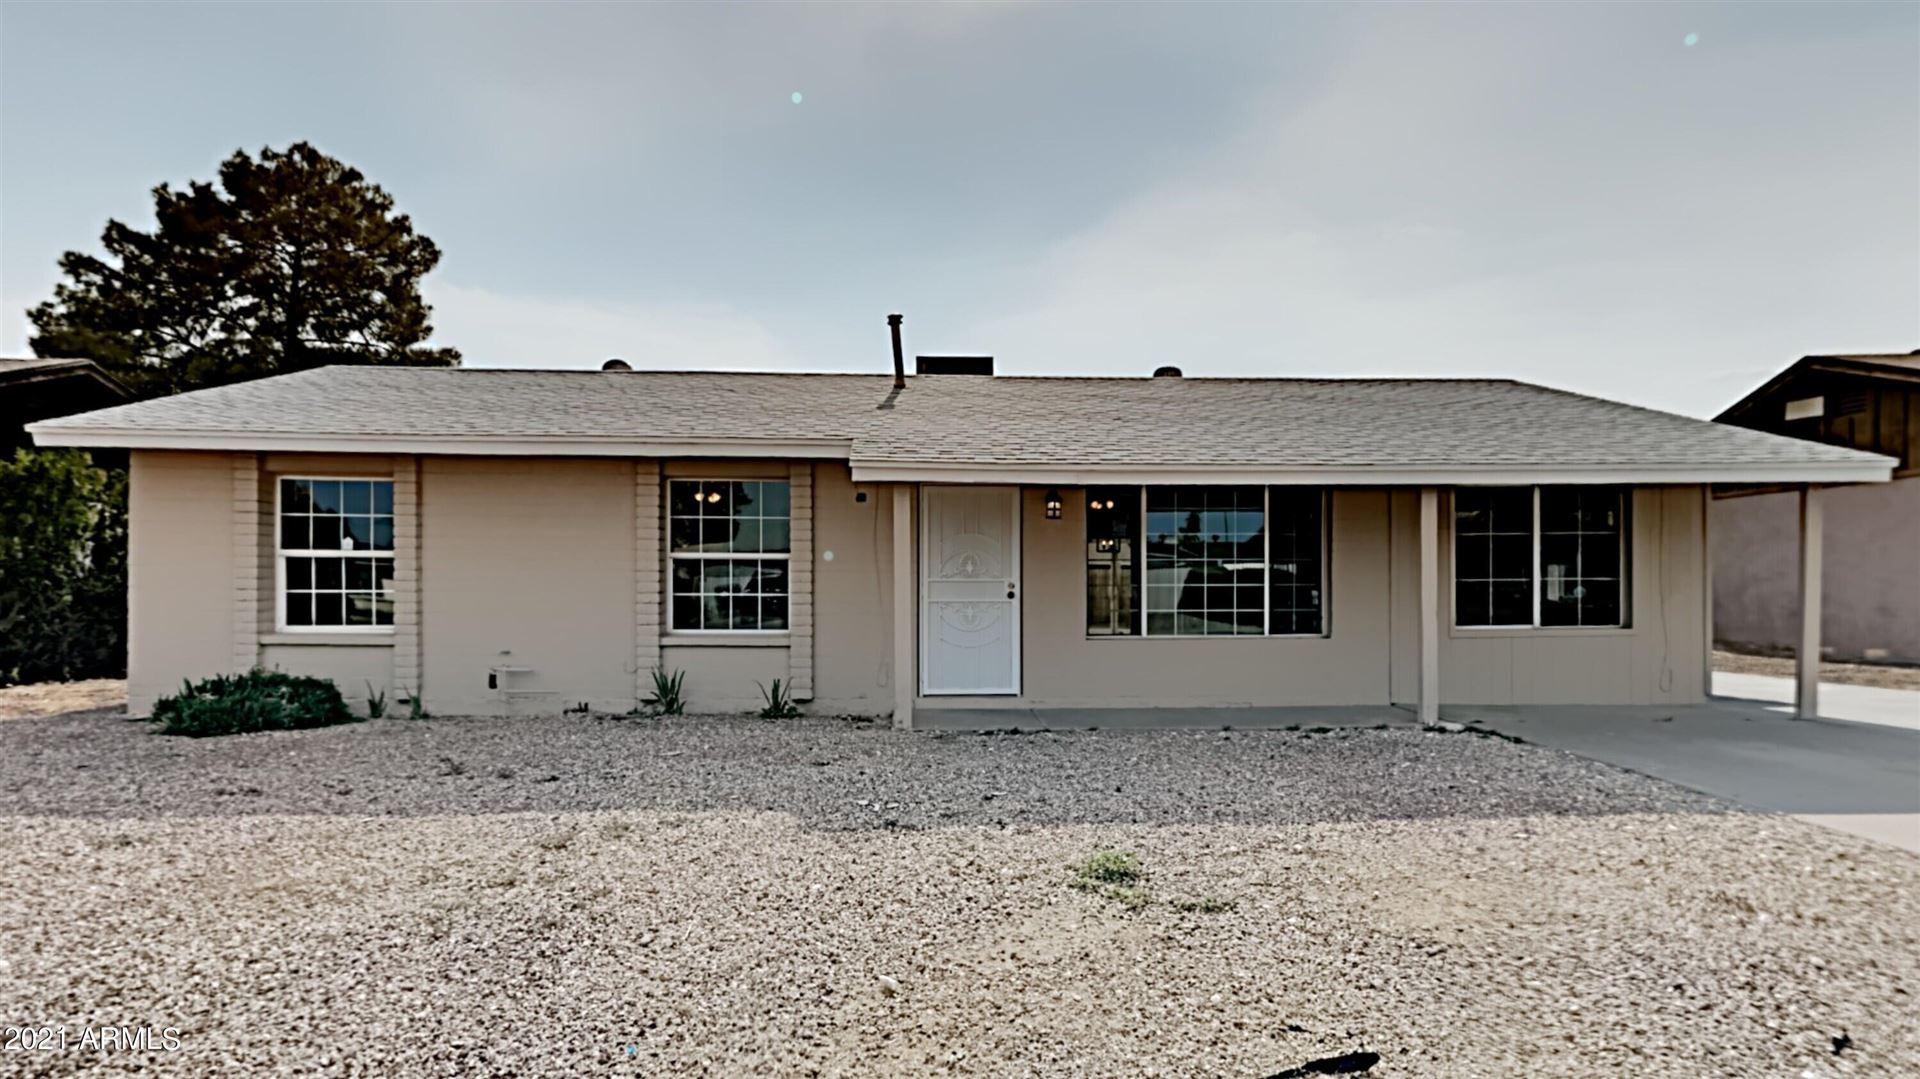 17244 N 13TH Avenue, Phoenix, AZ 85023 - MLS#: 6268987